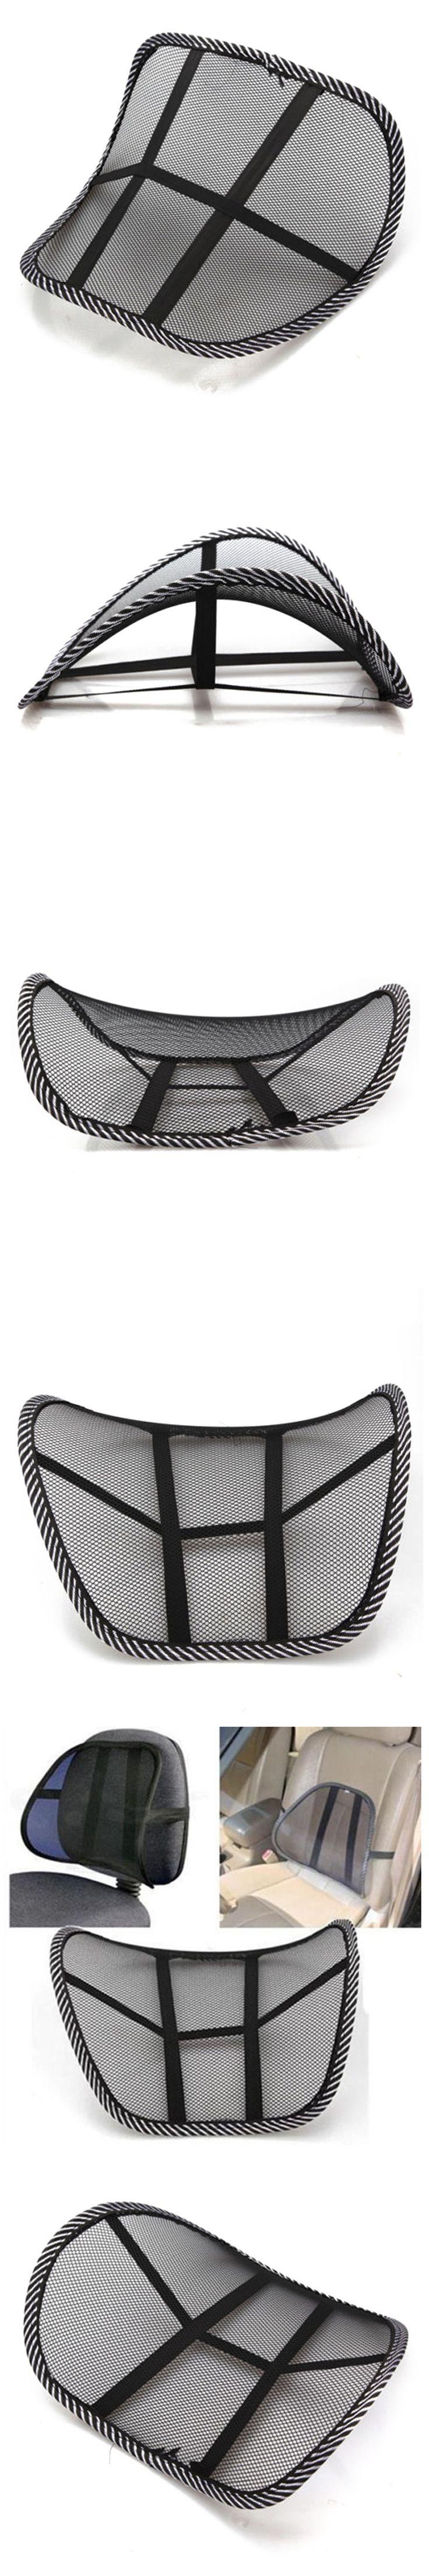 New Mesh Lumbar Back Brace Support Chair Cushion Seat Waist Pillow Posture Corrector